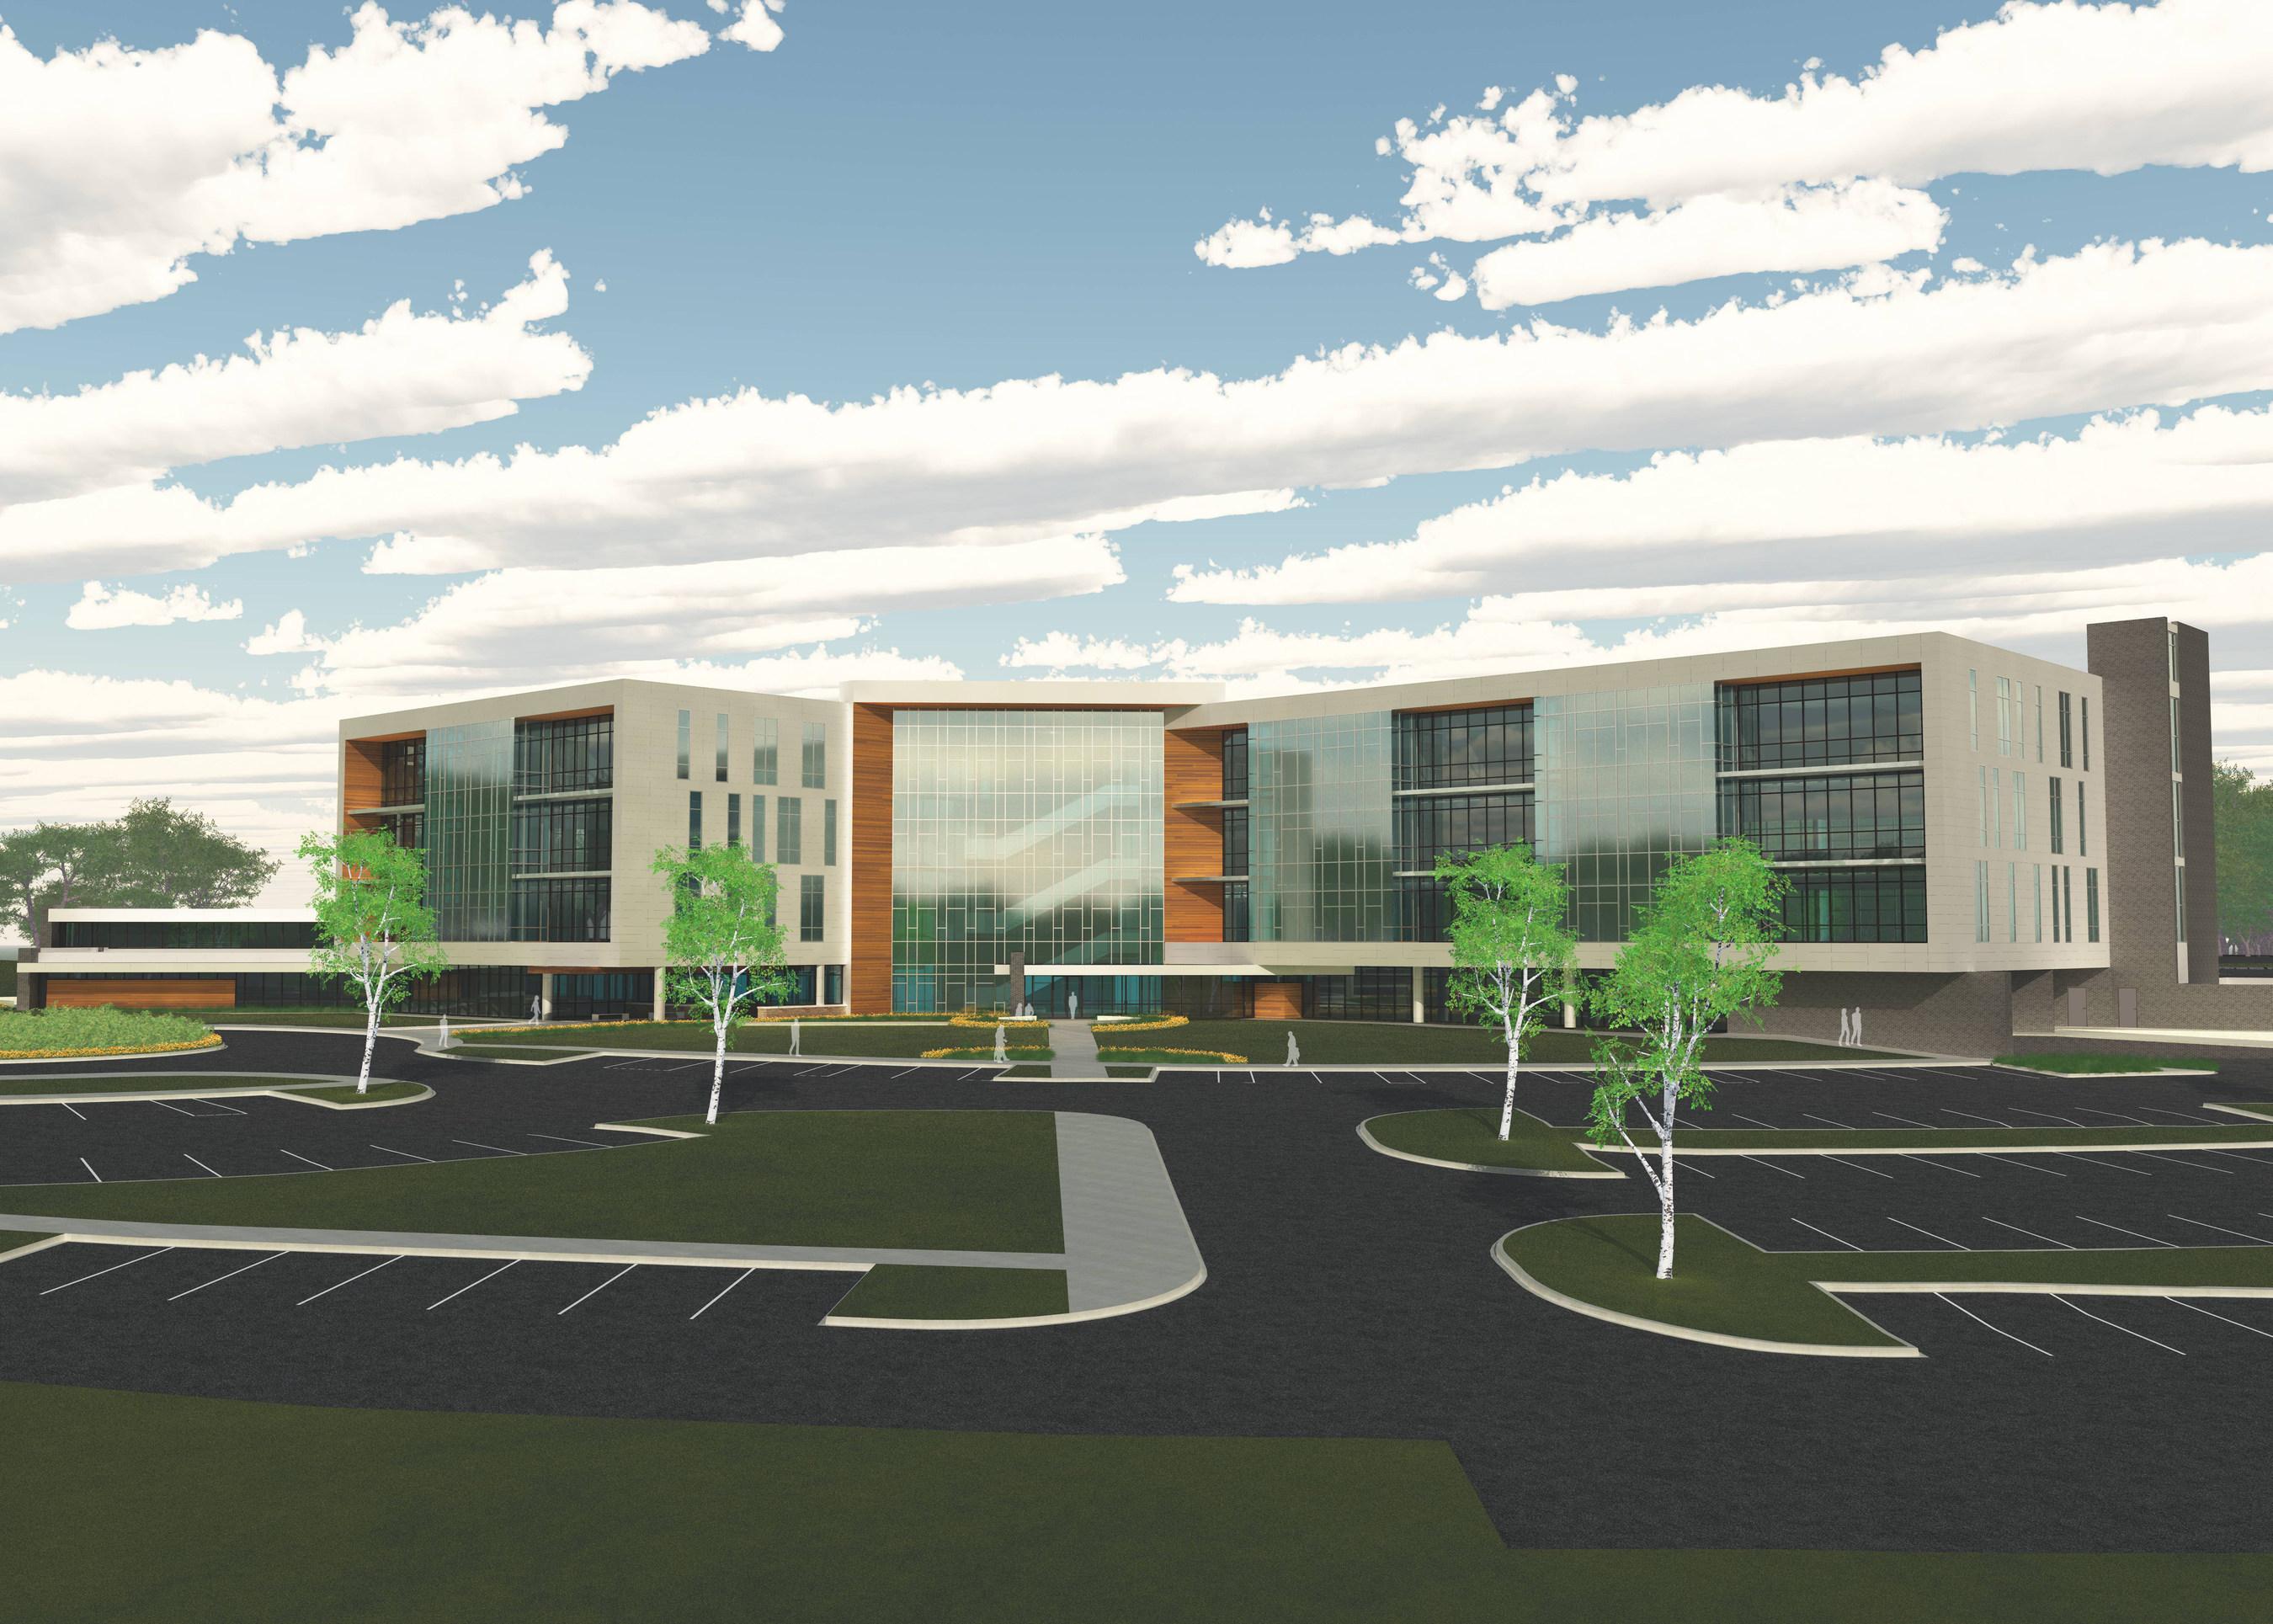 Rendering of ArcBest Corporation's Future Headquarters